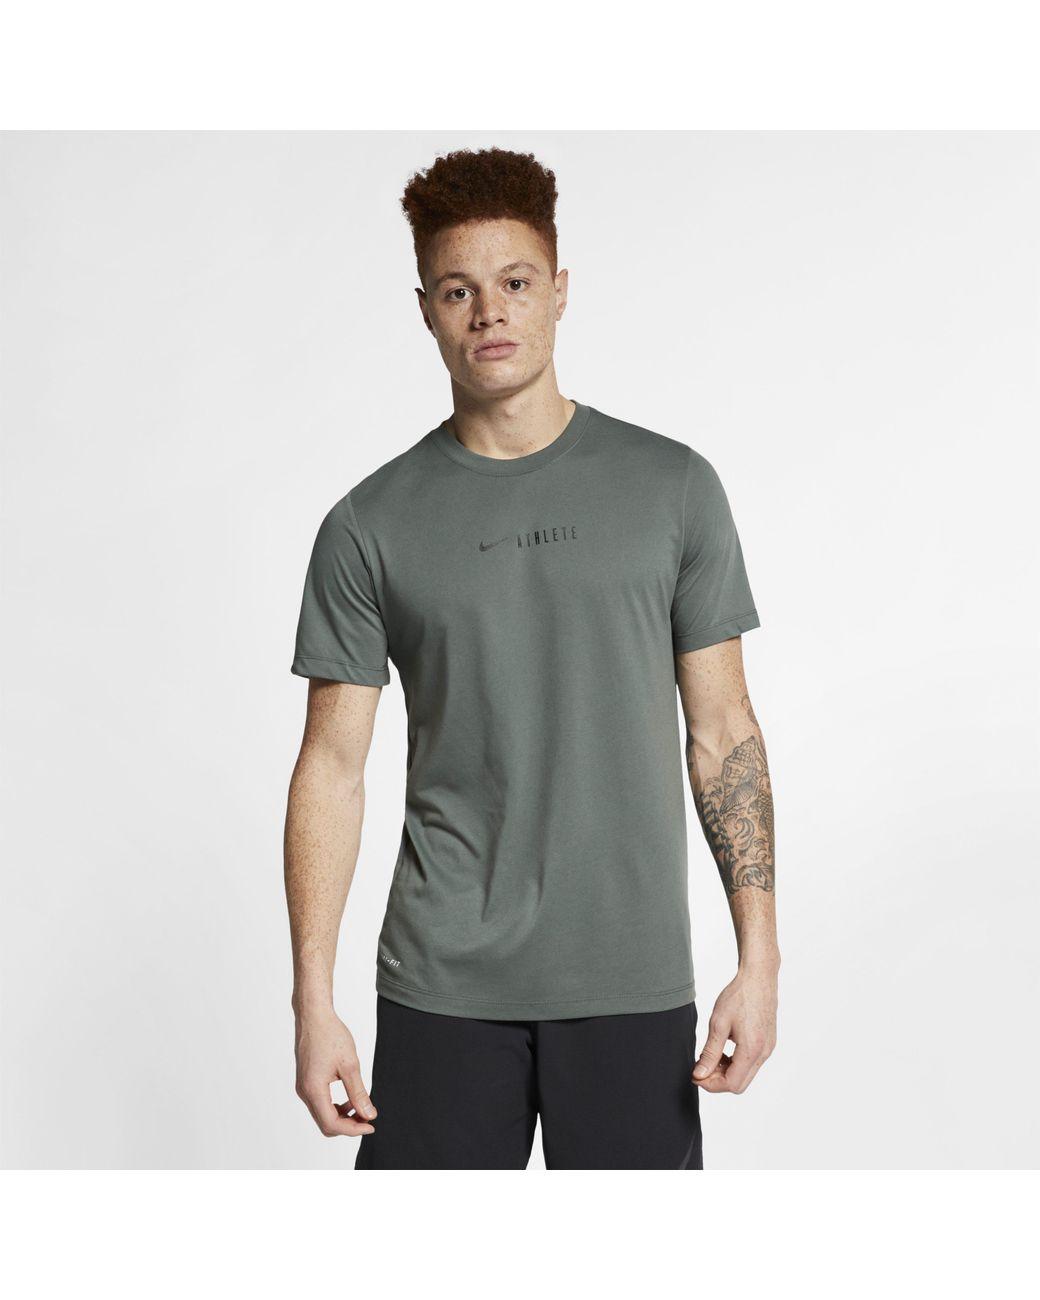 5b83a2ec8 Nike Dri-fit Training T-shirt in Green for Men - Lyst